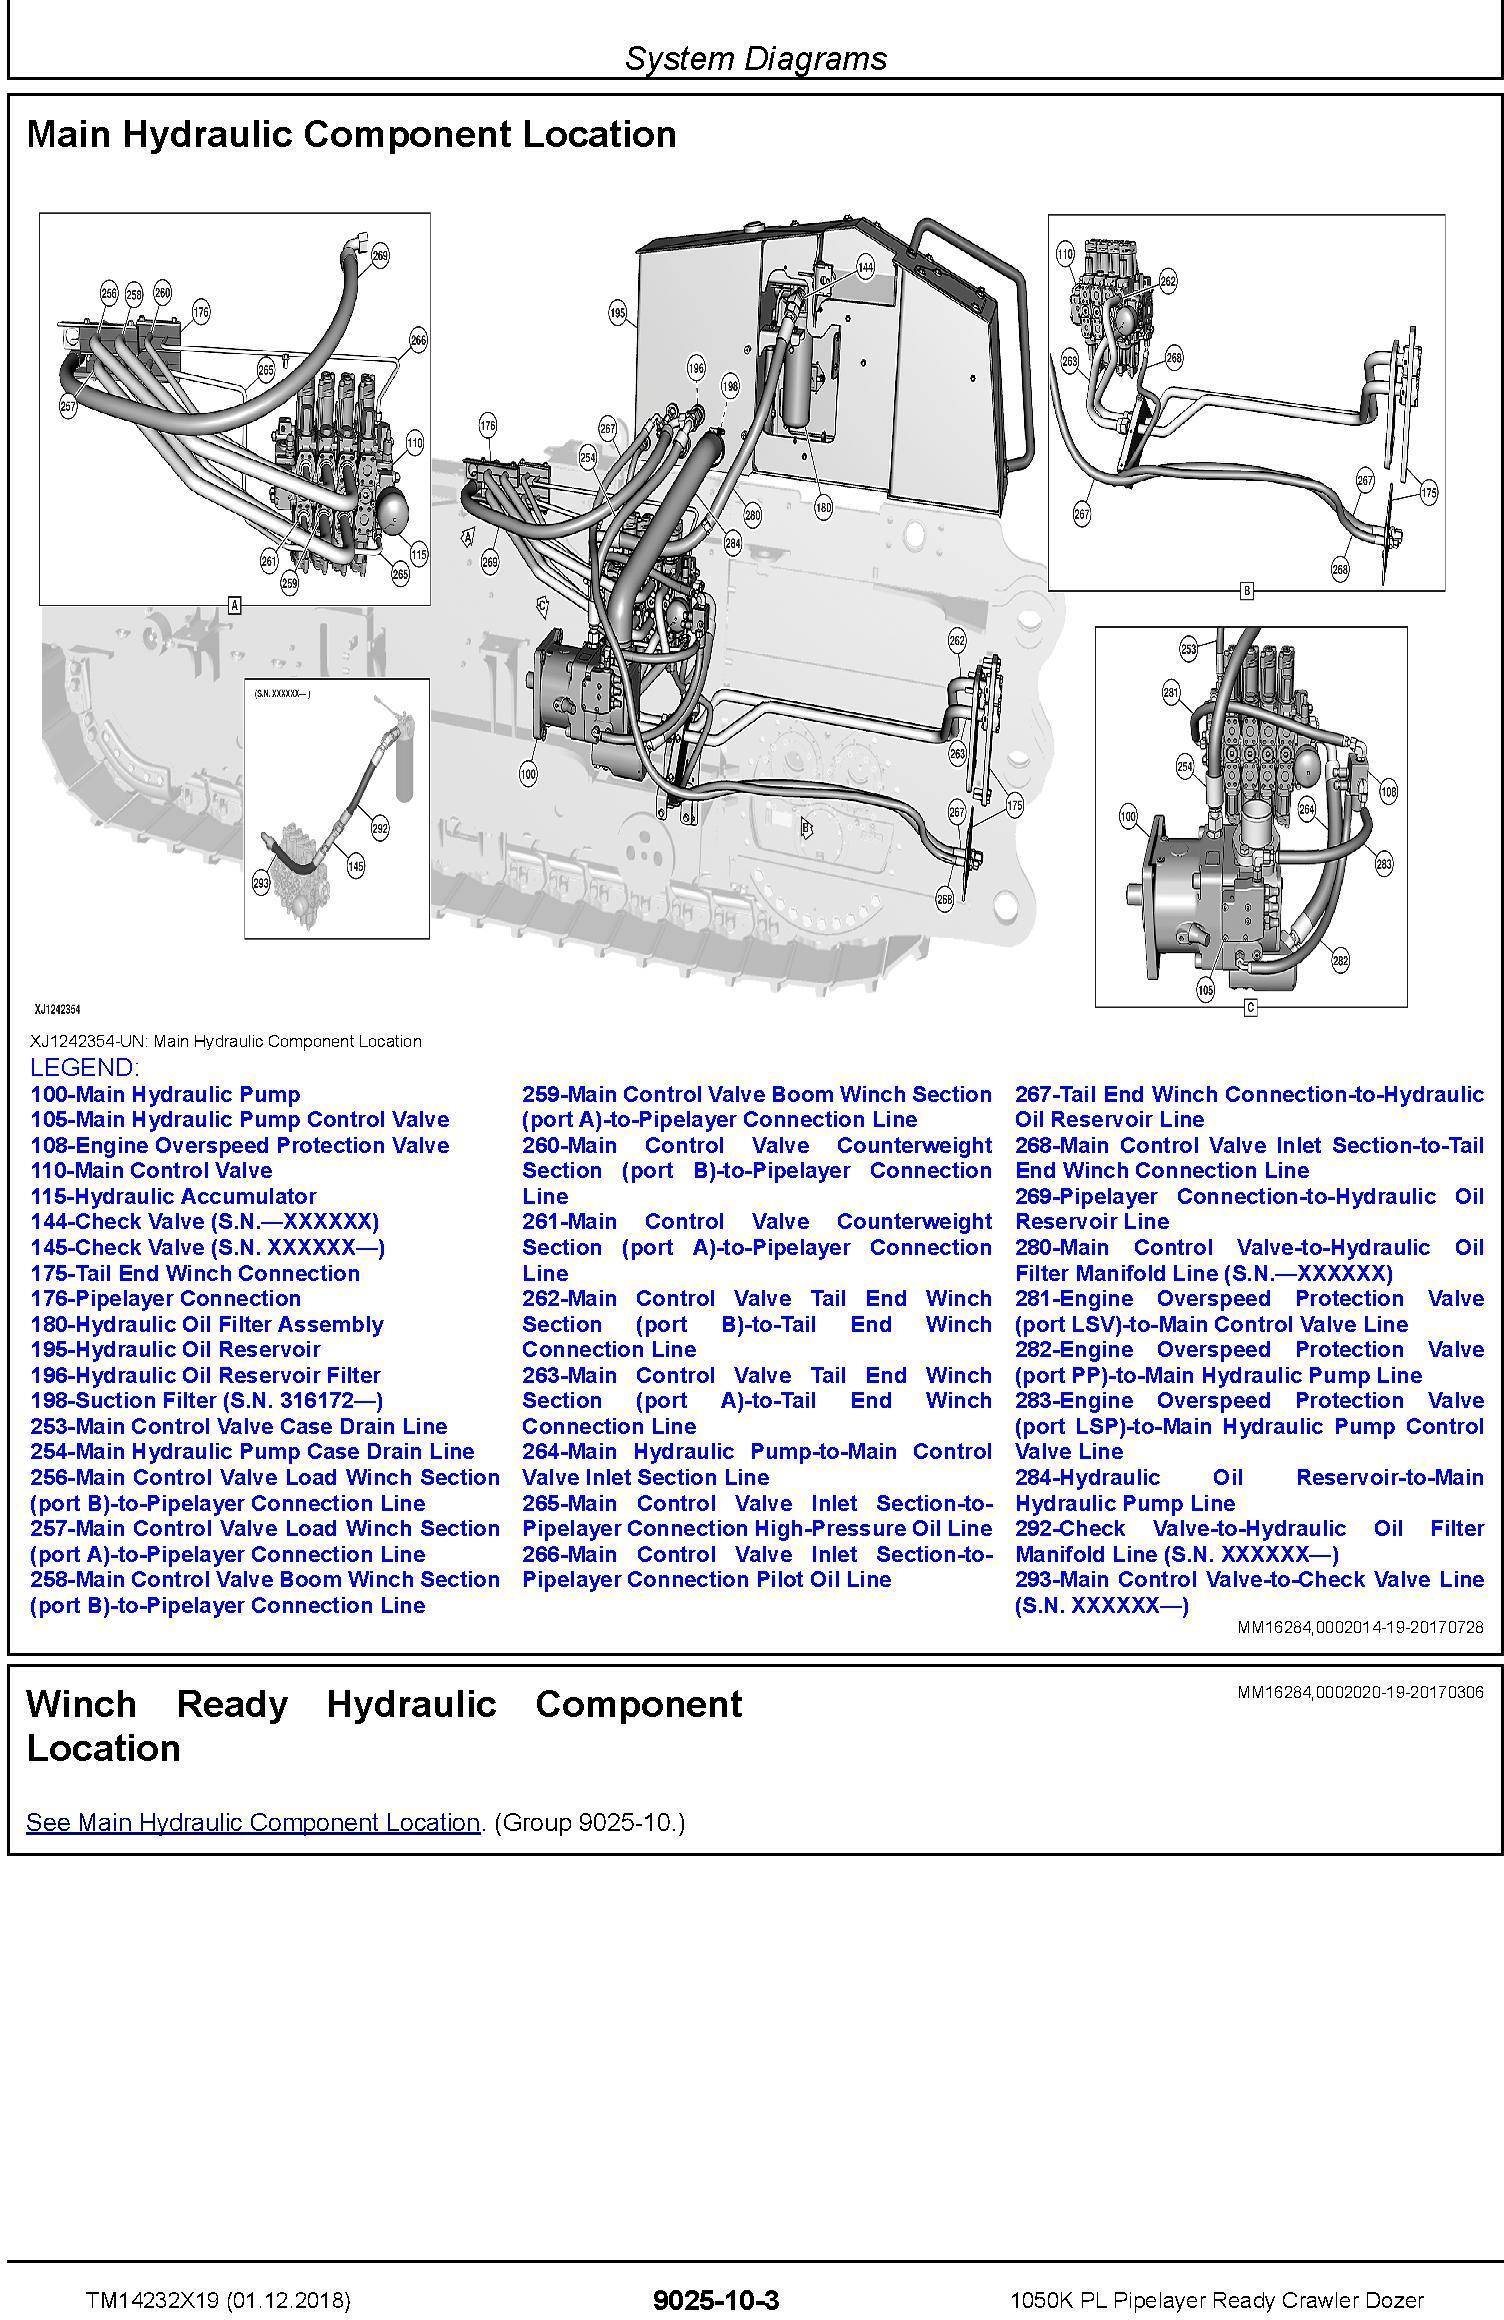 John Deere 1050K PL (SN.F310922-318801) Pipelayer Ready Crawler Dozer Diagnostic Manual (TM14232X19) - 3